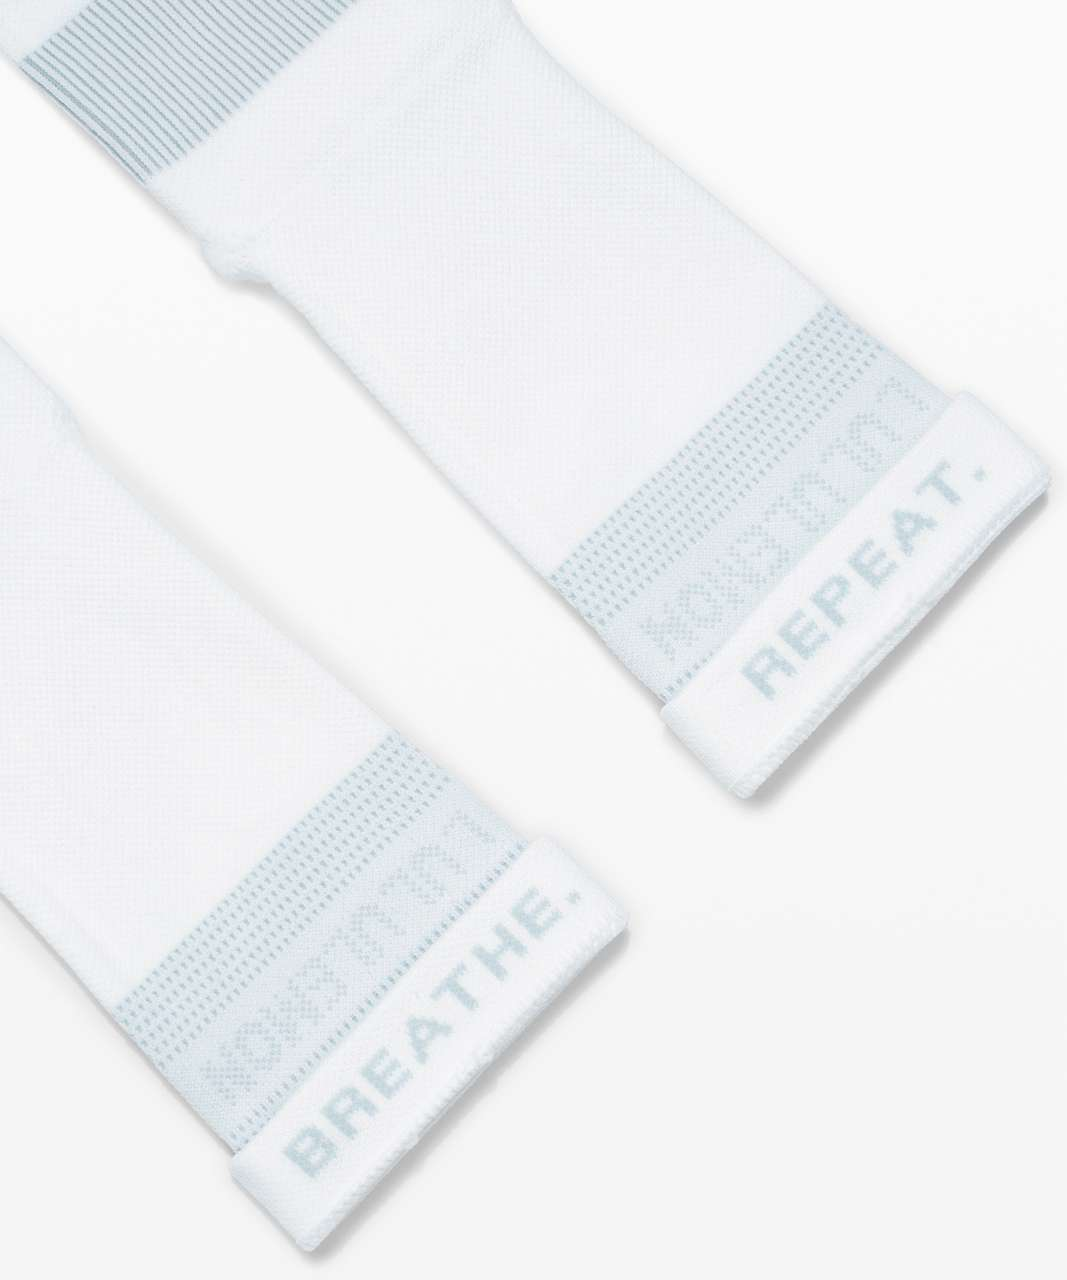 Lululemon Power Stride Crew Sock *Mantra - White / Hazy Jade